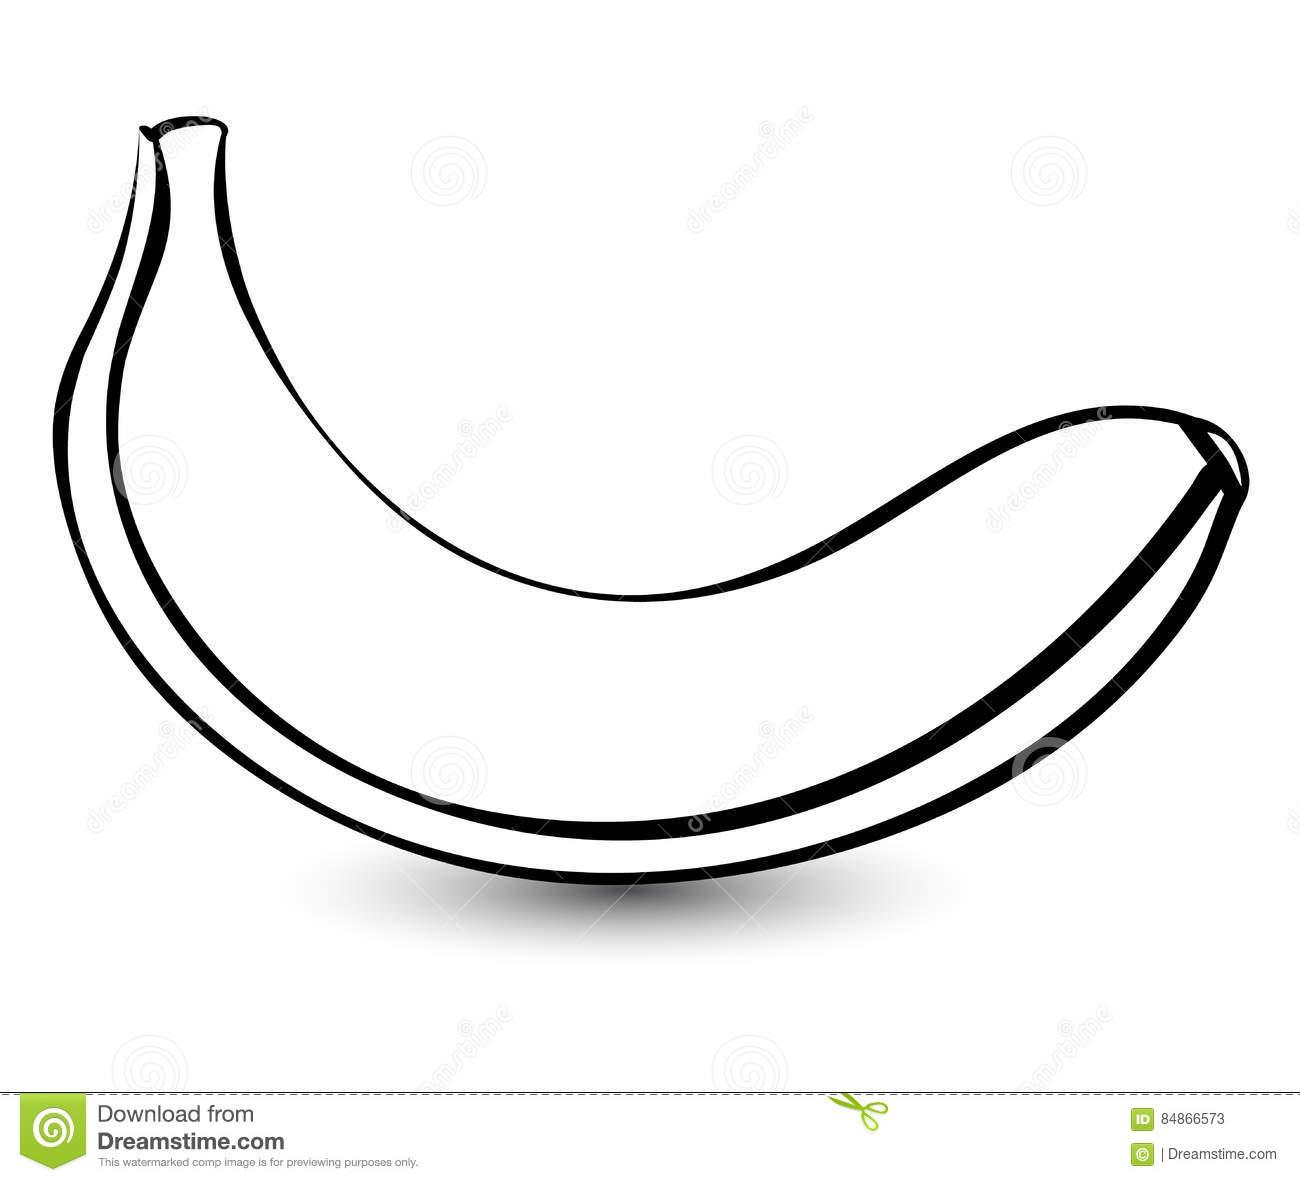 Banana Outline Clipart